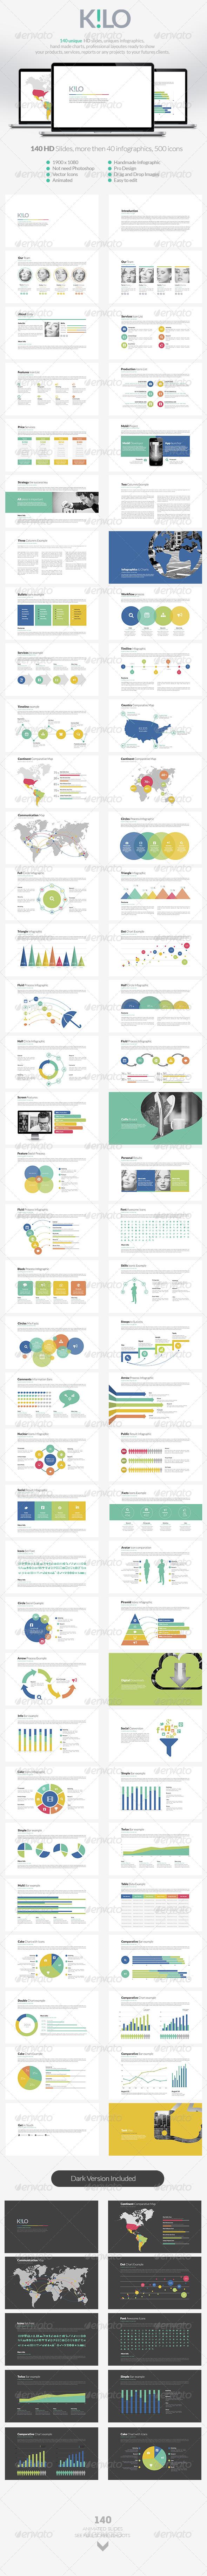 GraphicRiver Kilo Keynote Presentation 8558154